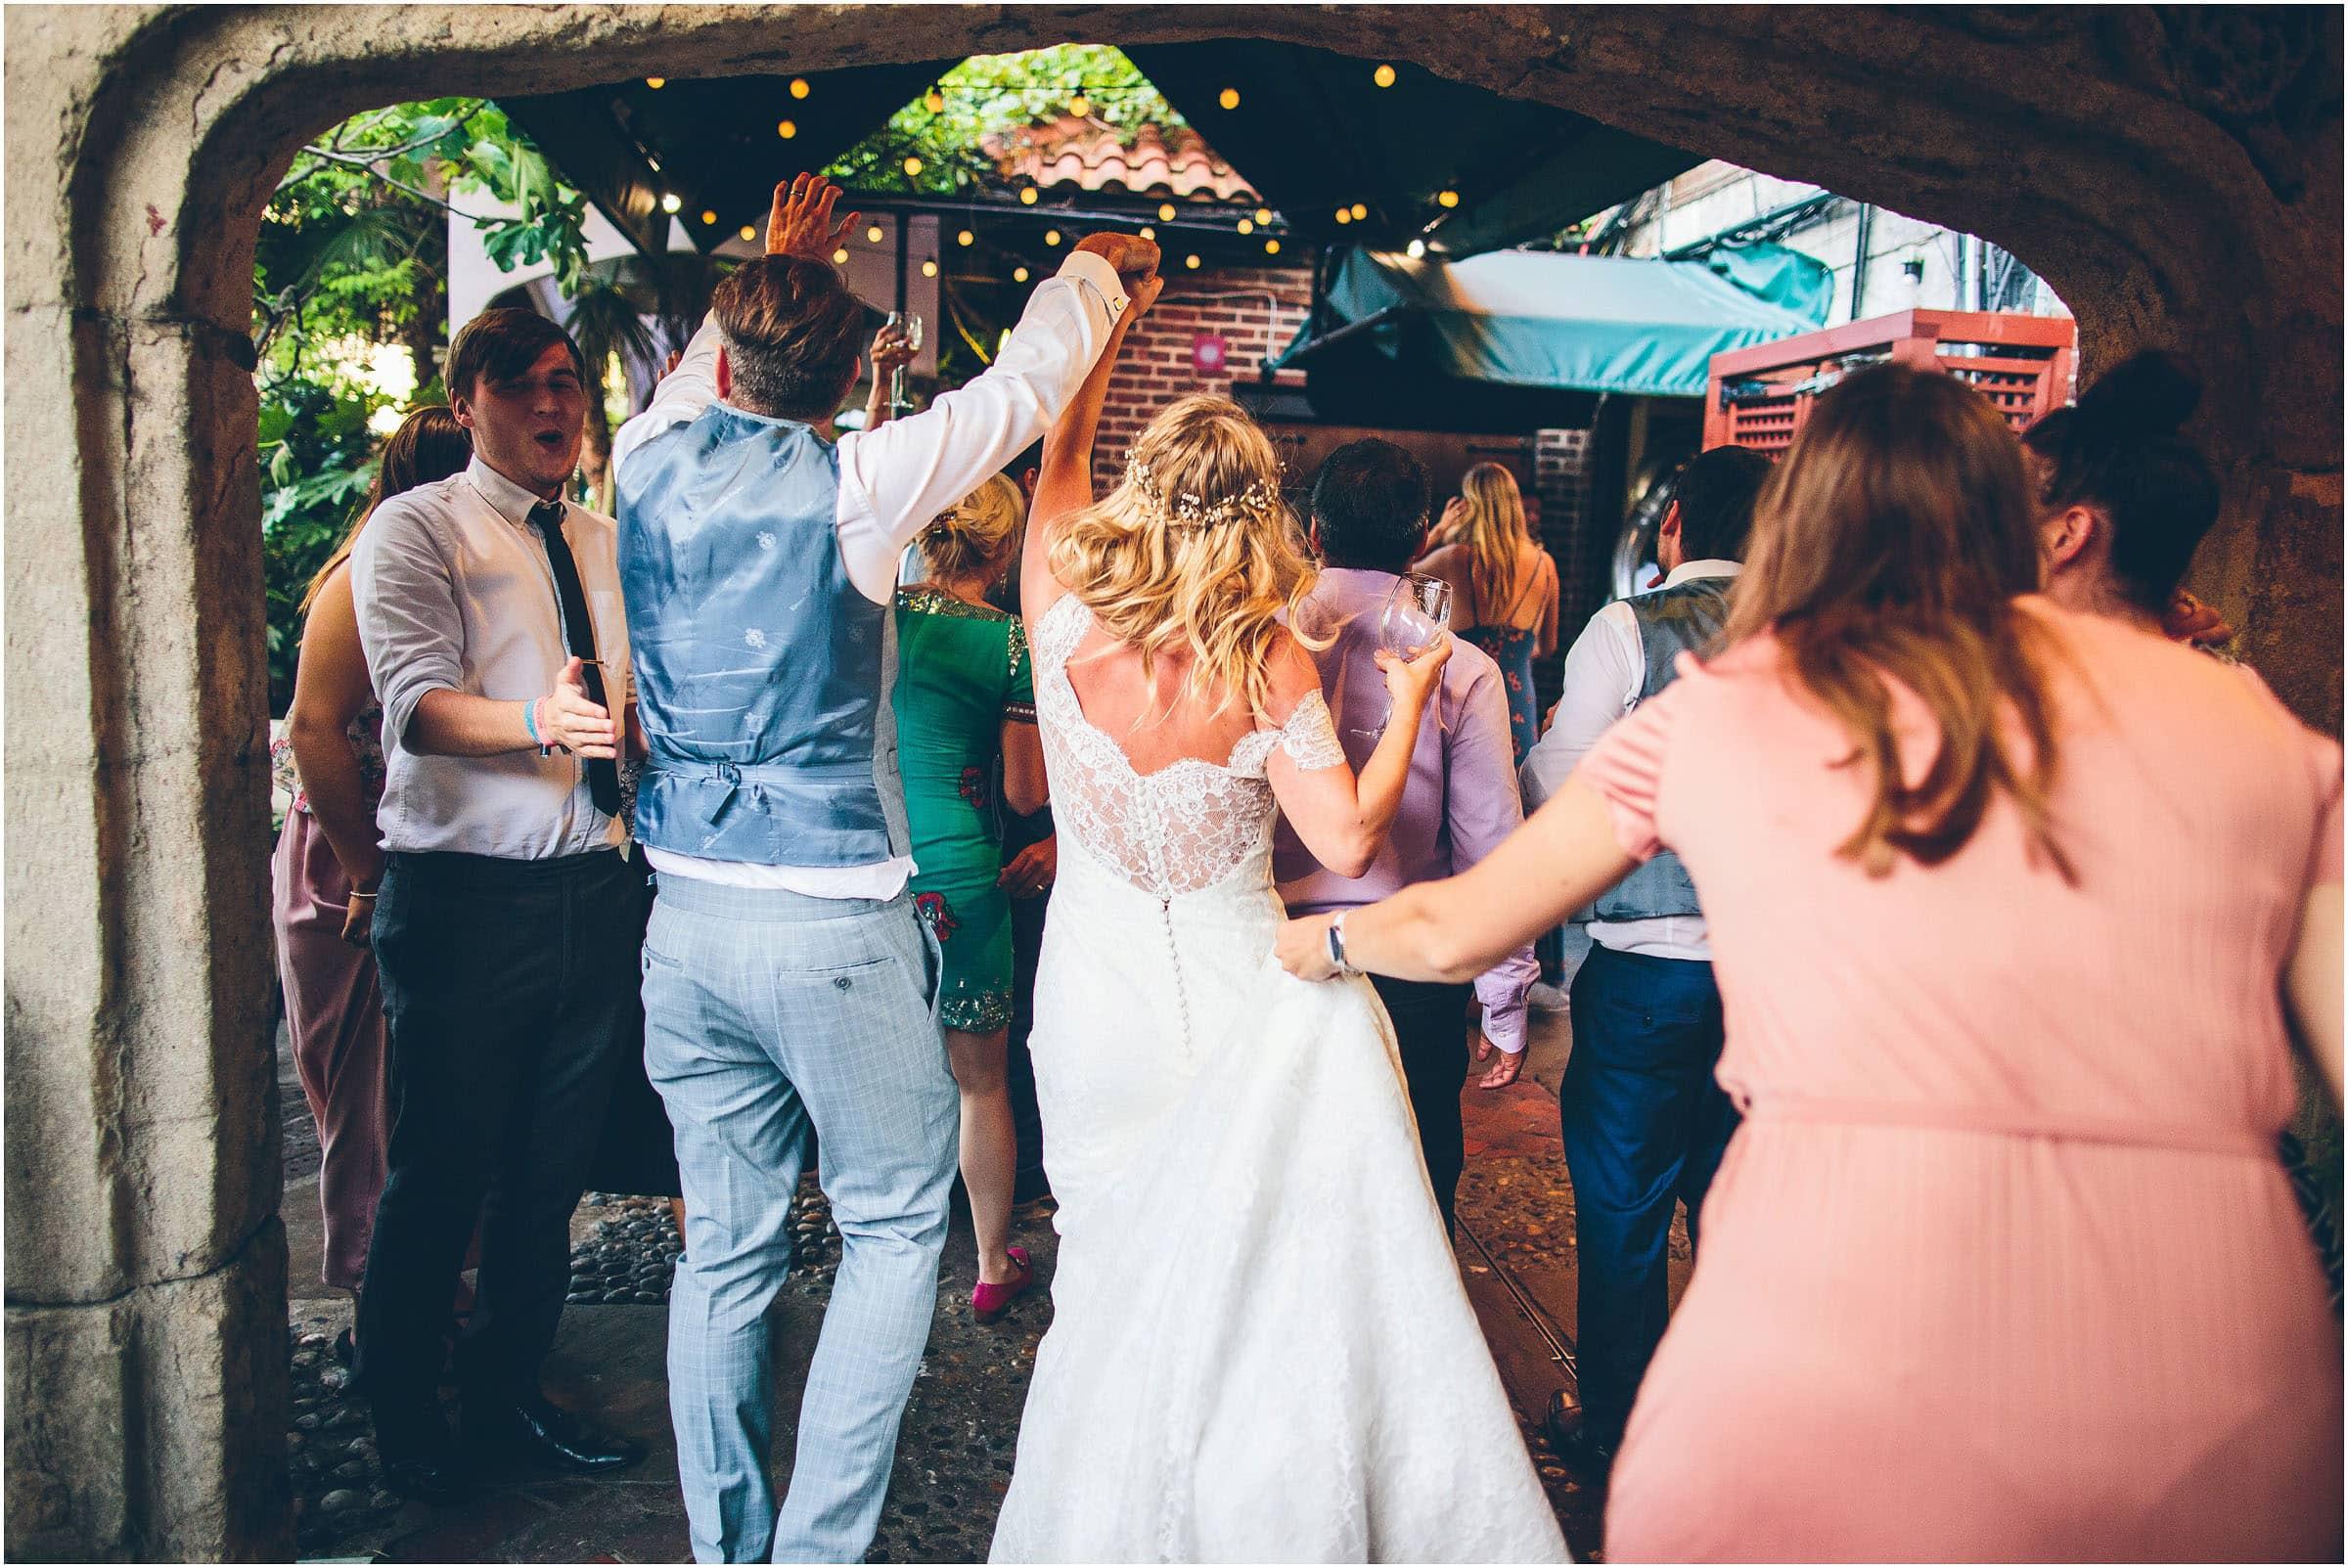 Kensington_Roof_Gardens_Wedding_Photography_0110